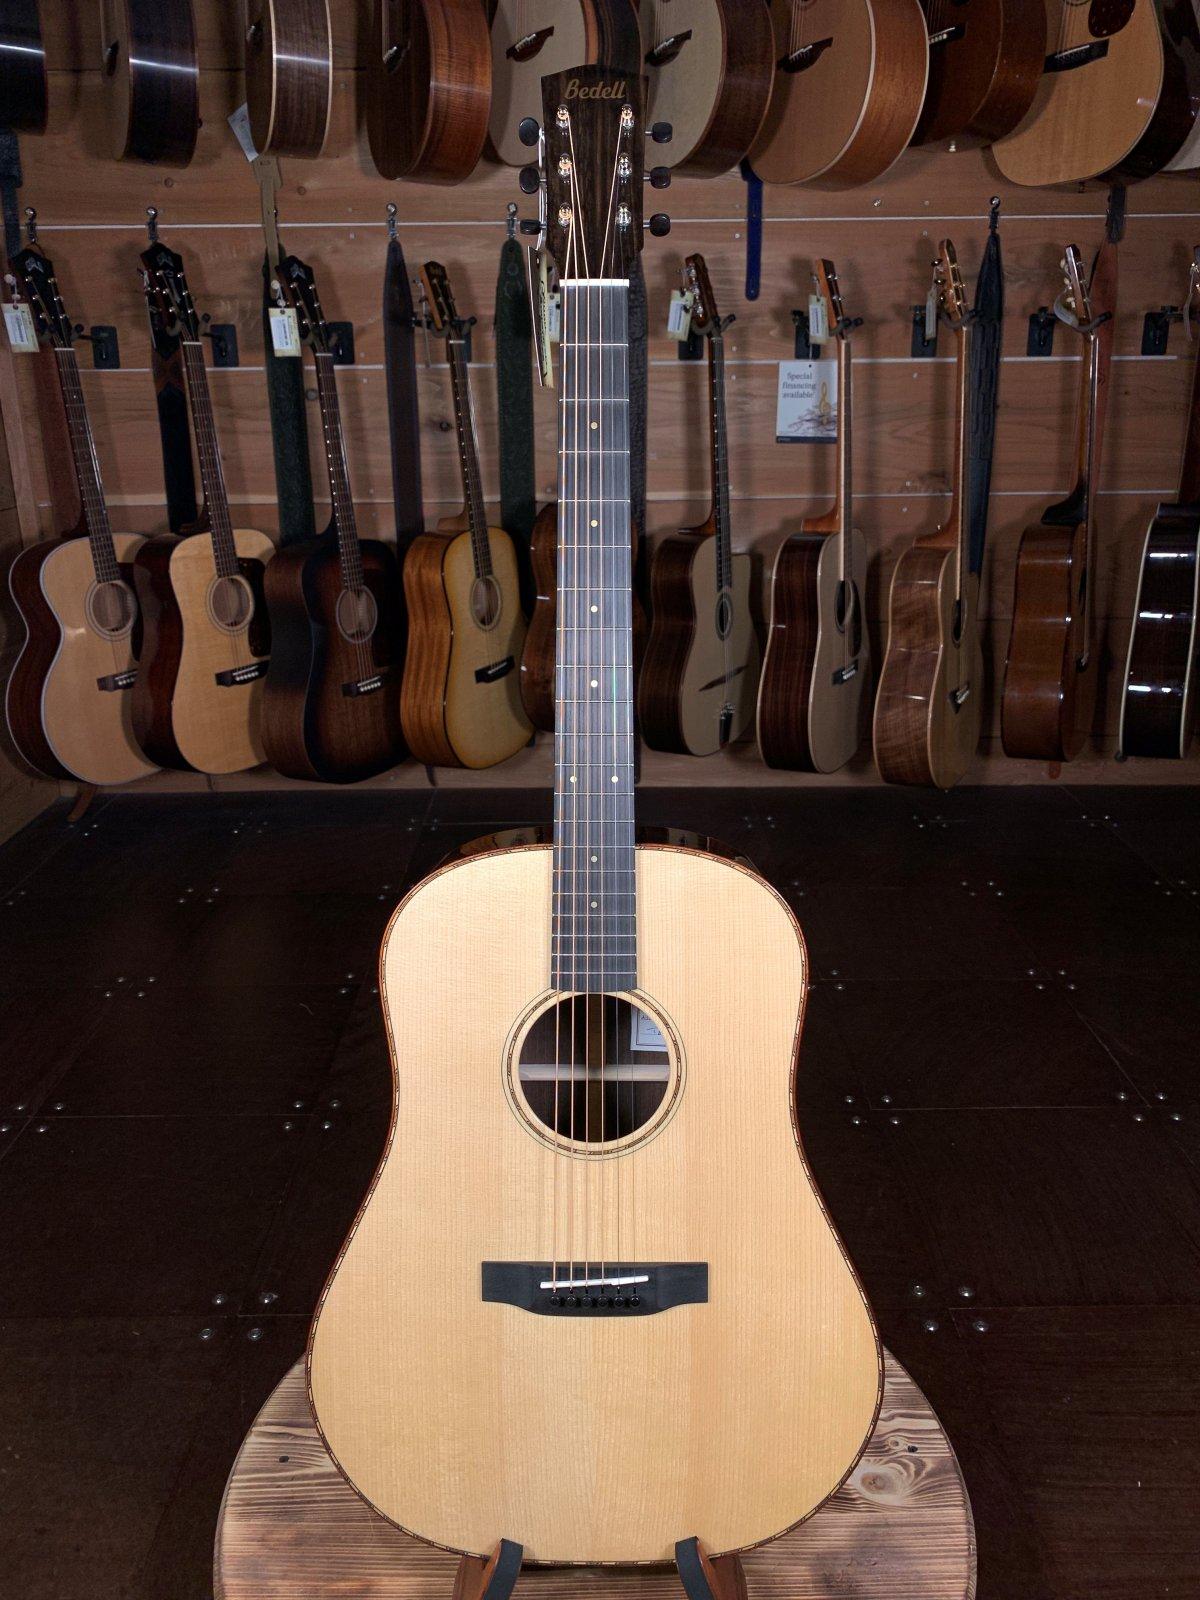 Bedell Bahia Dreadnaught Acoustic / Brazilian Rosewood & Adirondack Spruce #8021